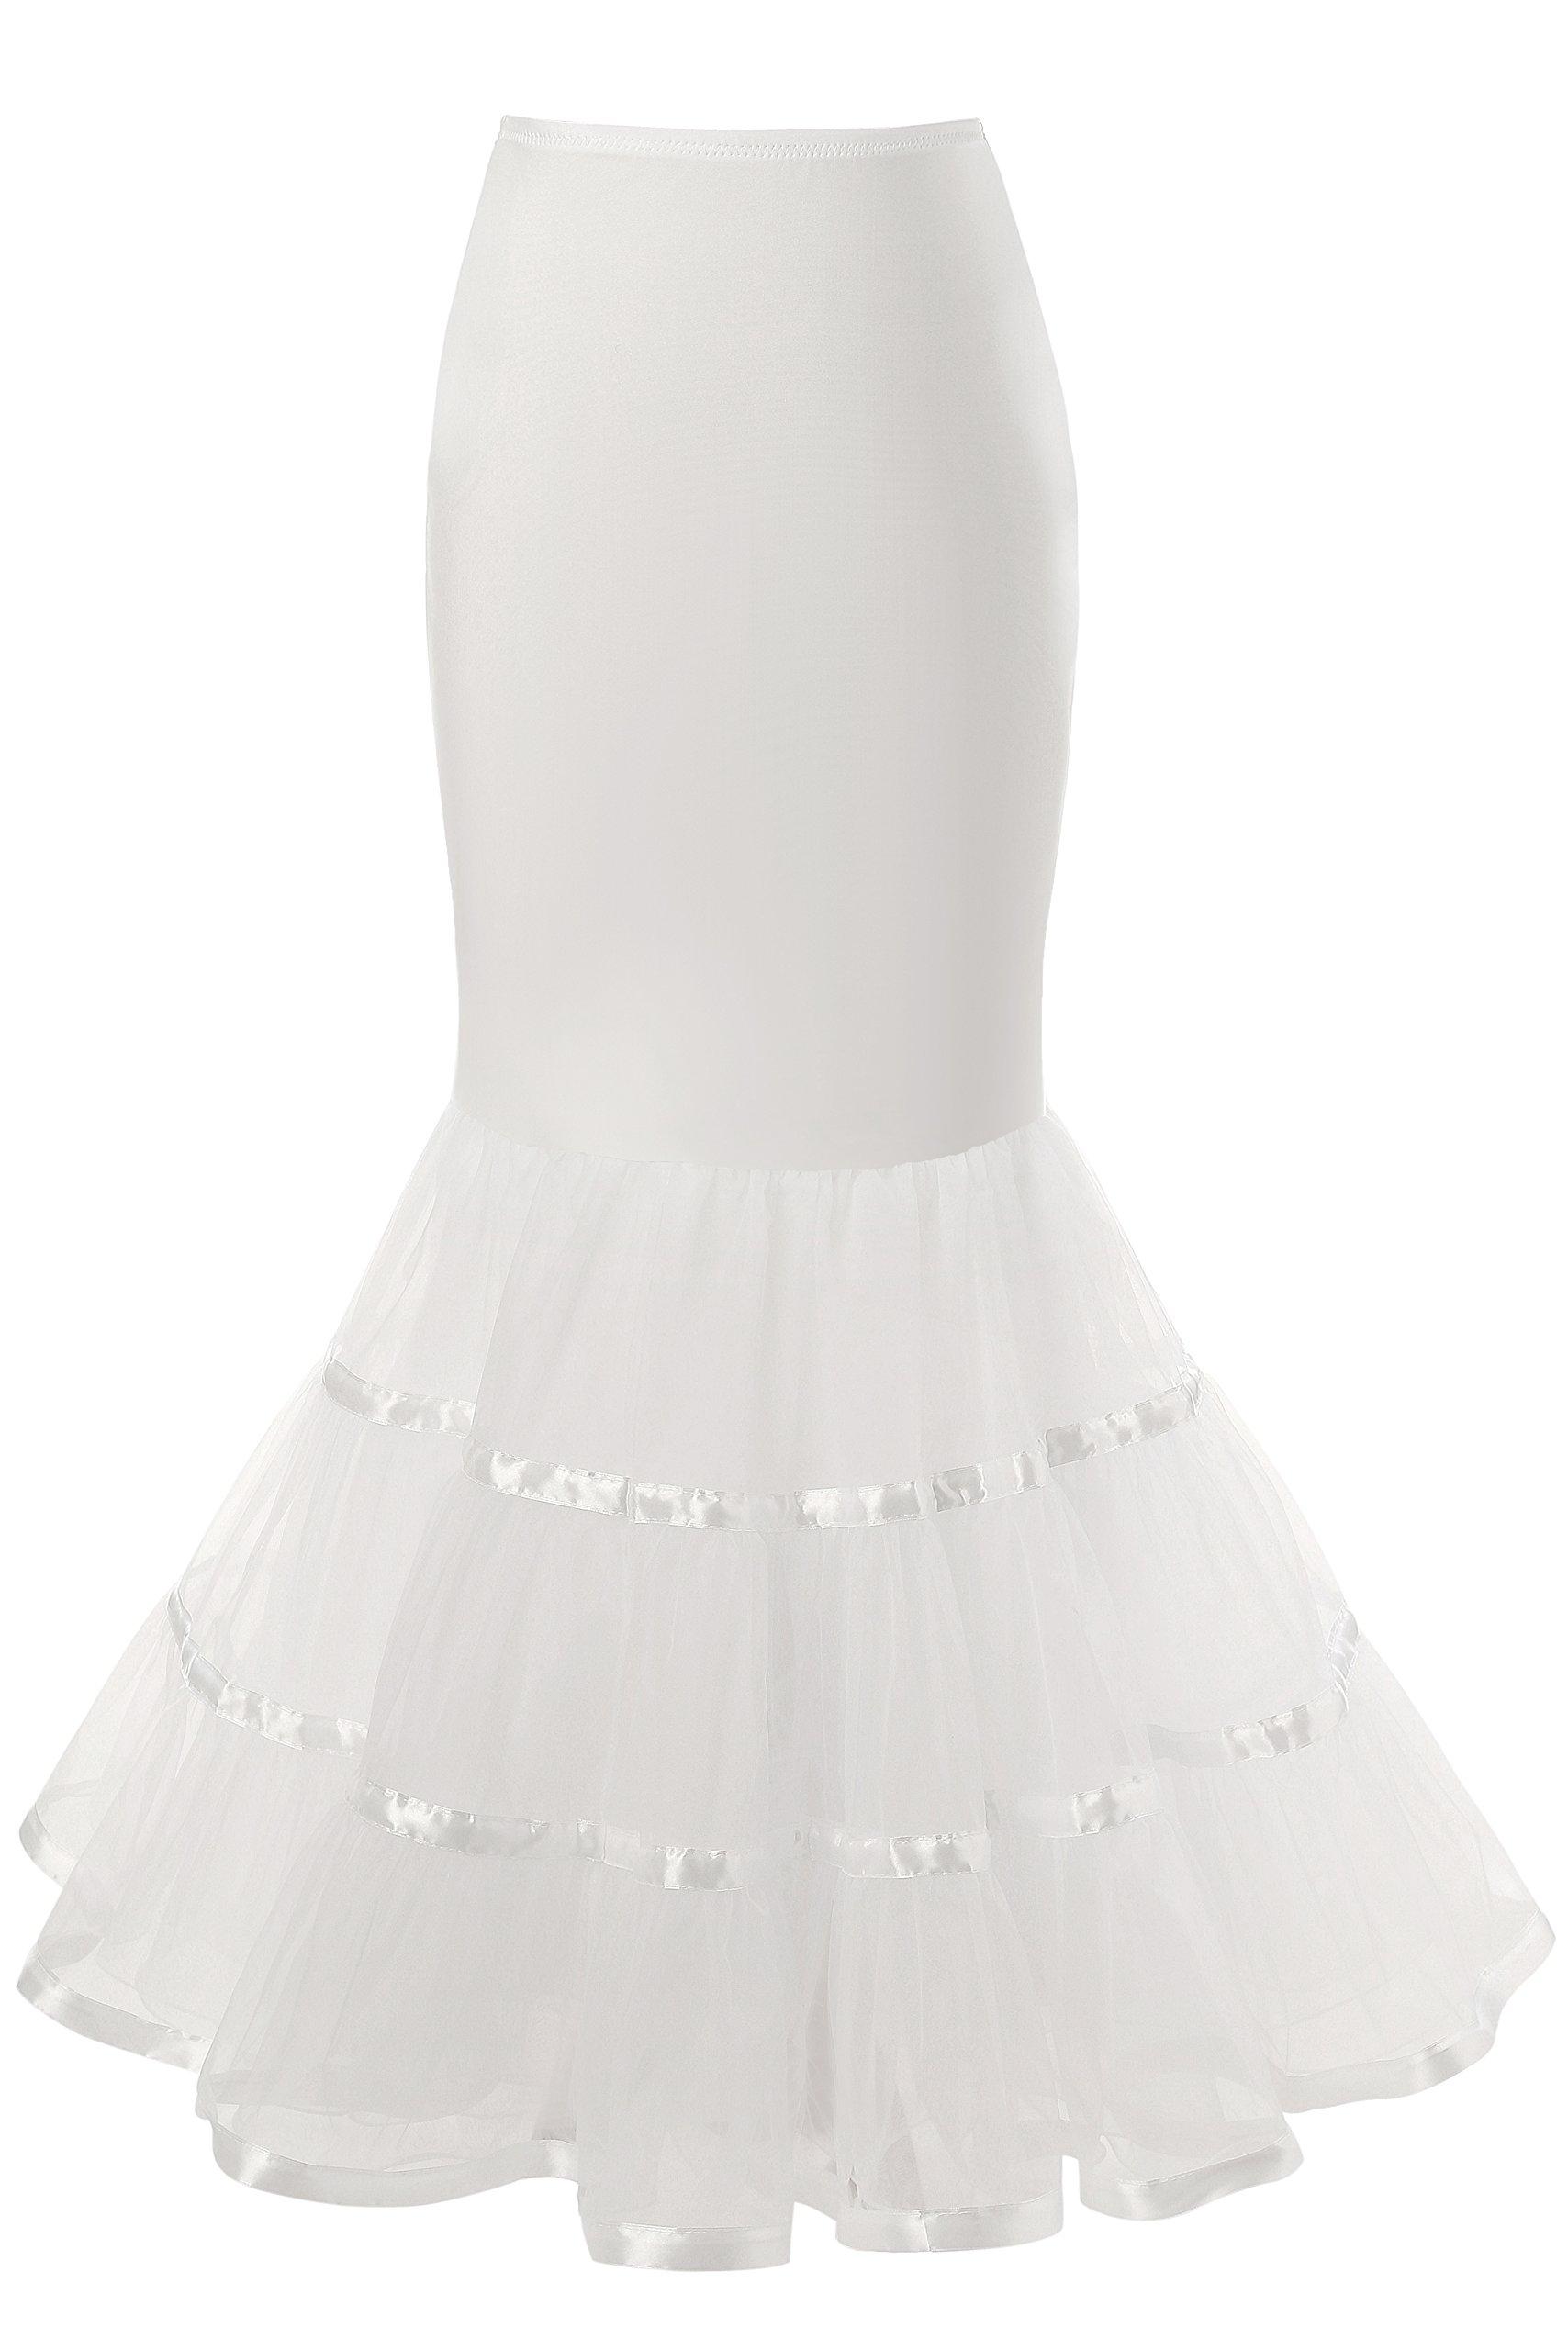 Snowskite Womens 3 Layers Floor Length Trumpet Mermaid Wedding Dress Petticoat, White, L/XL